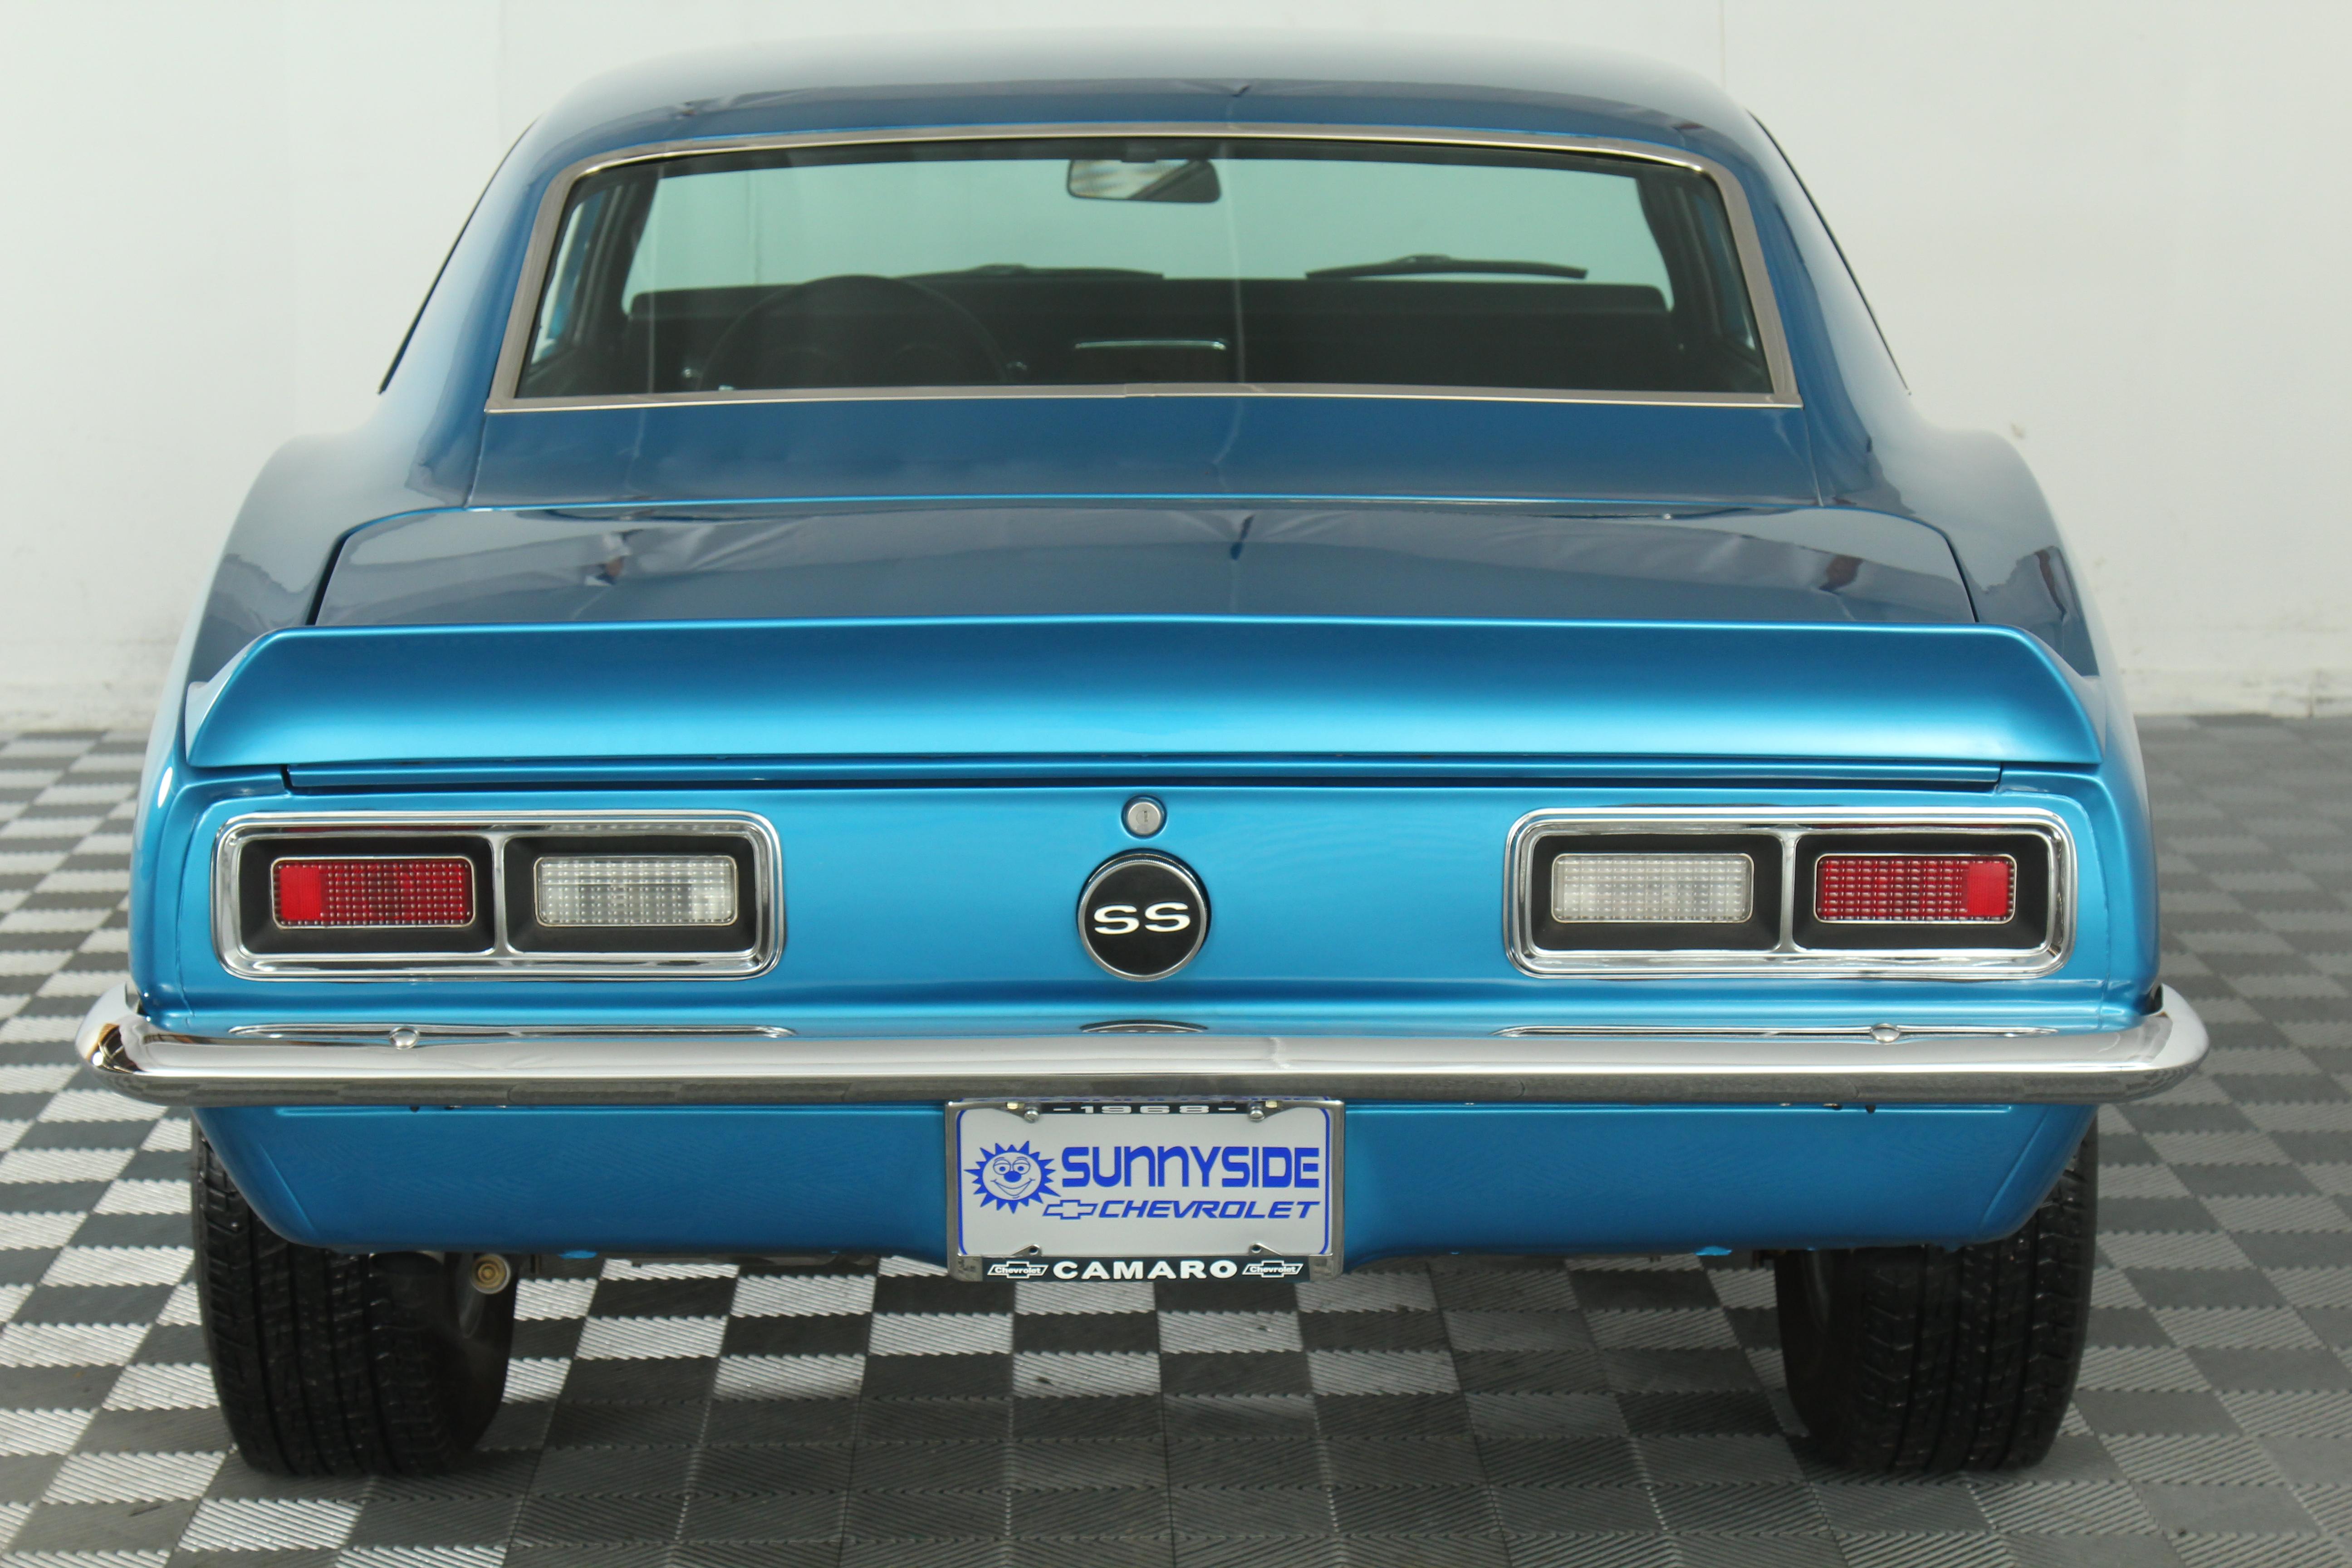 1968 Chevrolet Camaro Elyriaohio Sale Blue